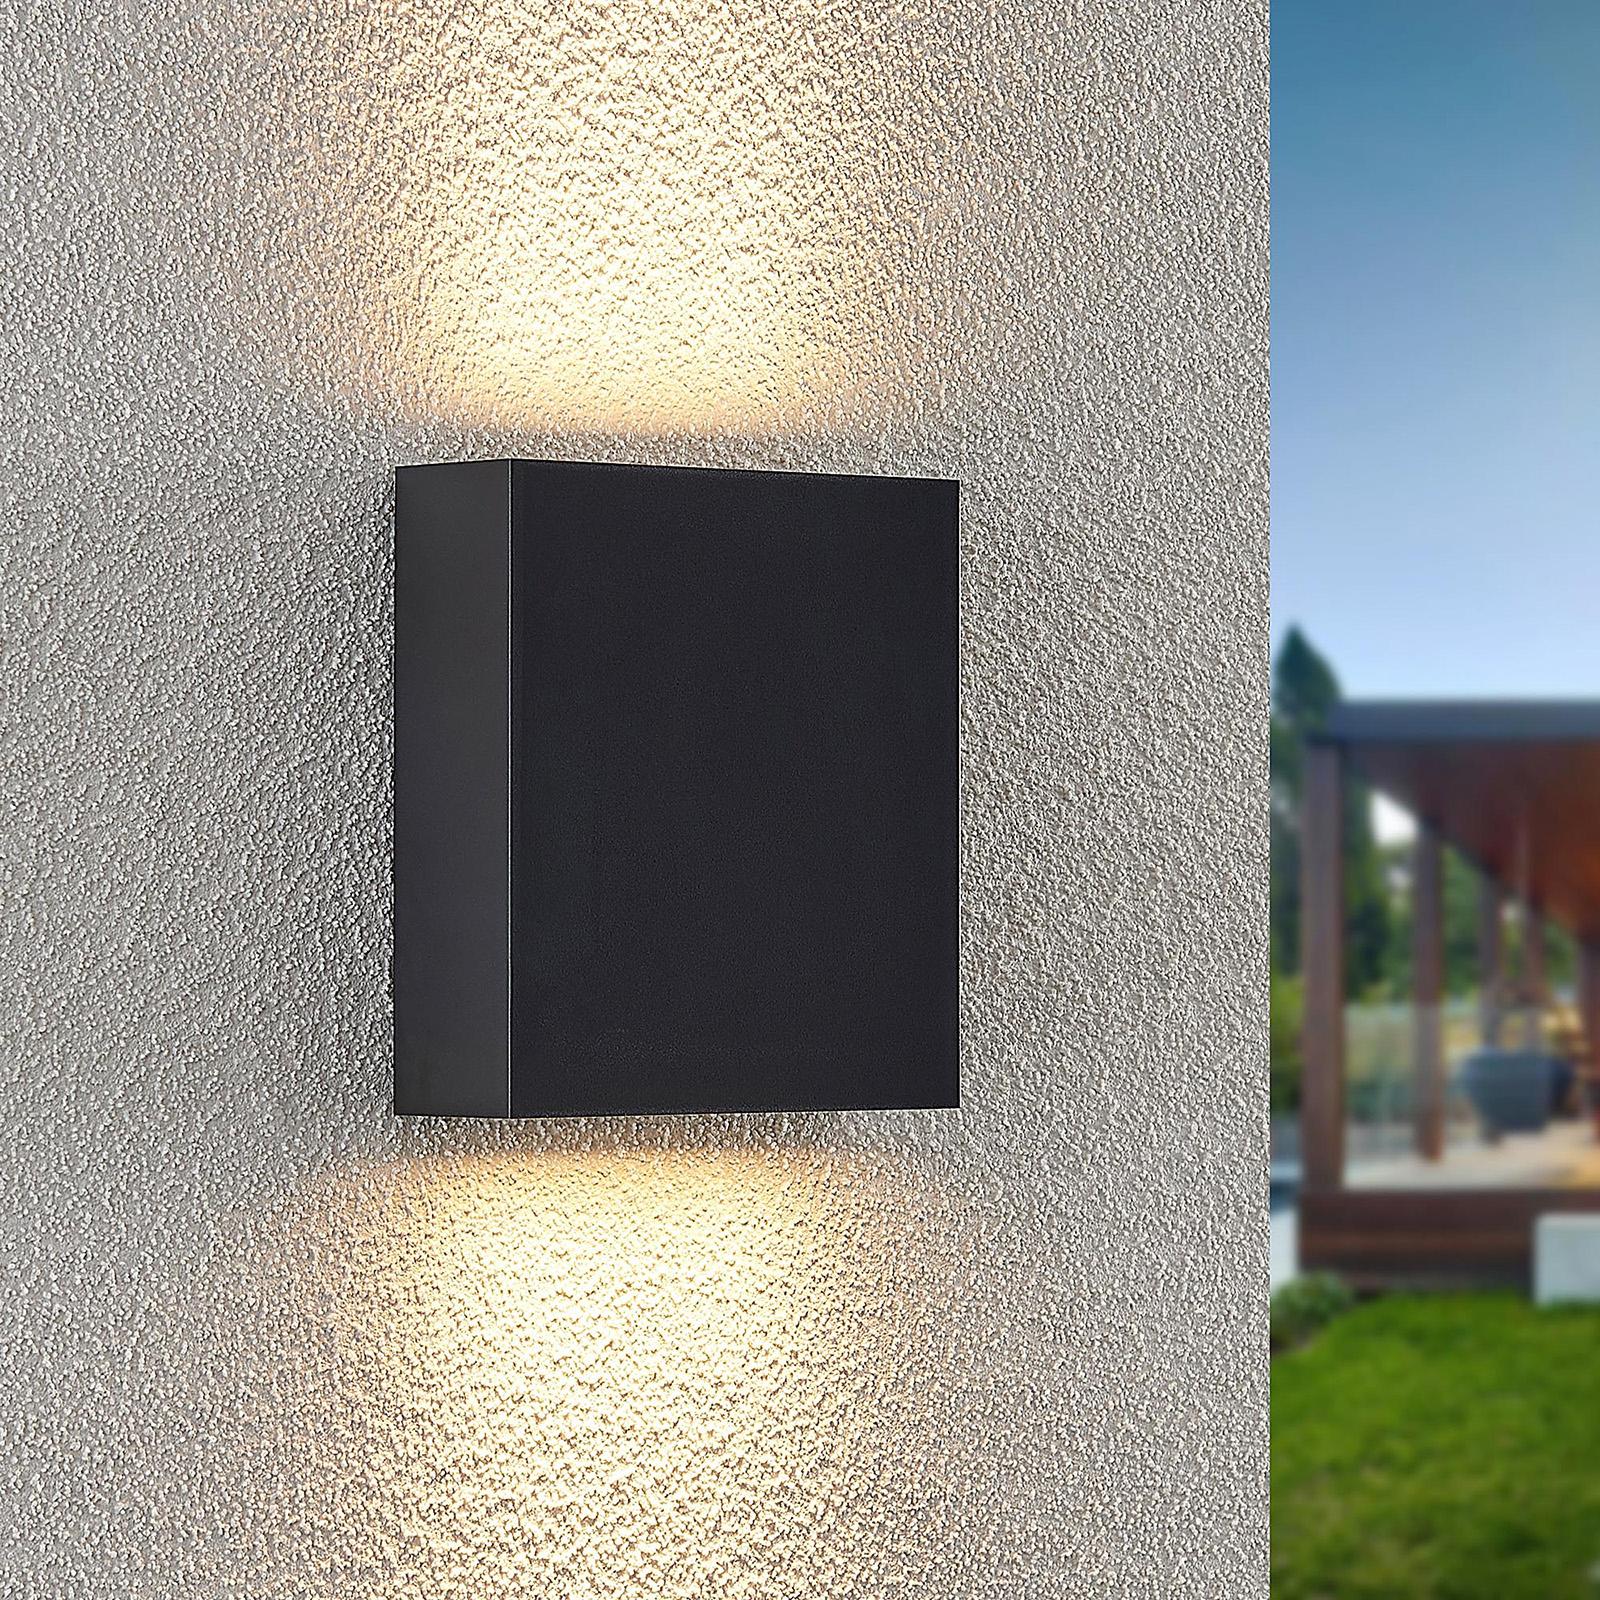 Lindby Ugar utendørs LED-vegglampe, 13 cm up/down